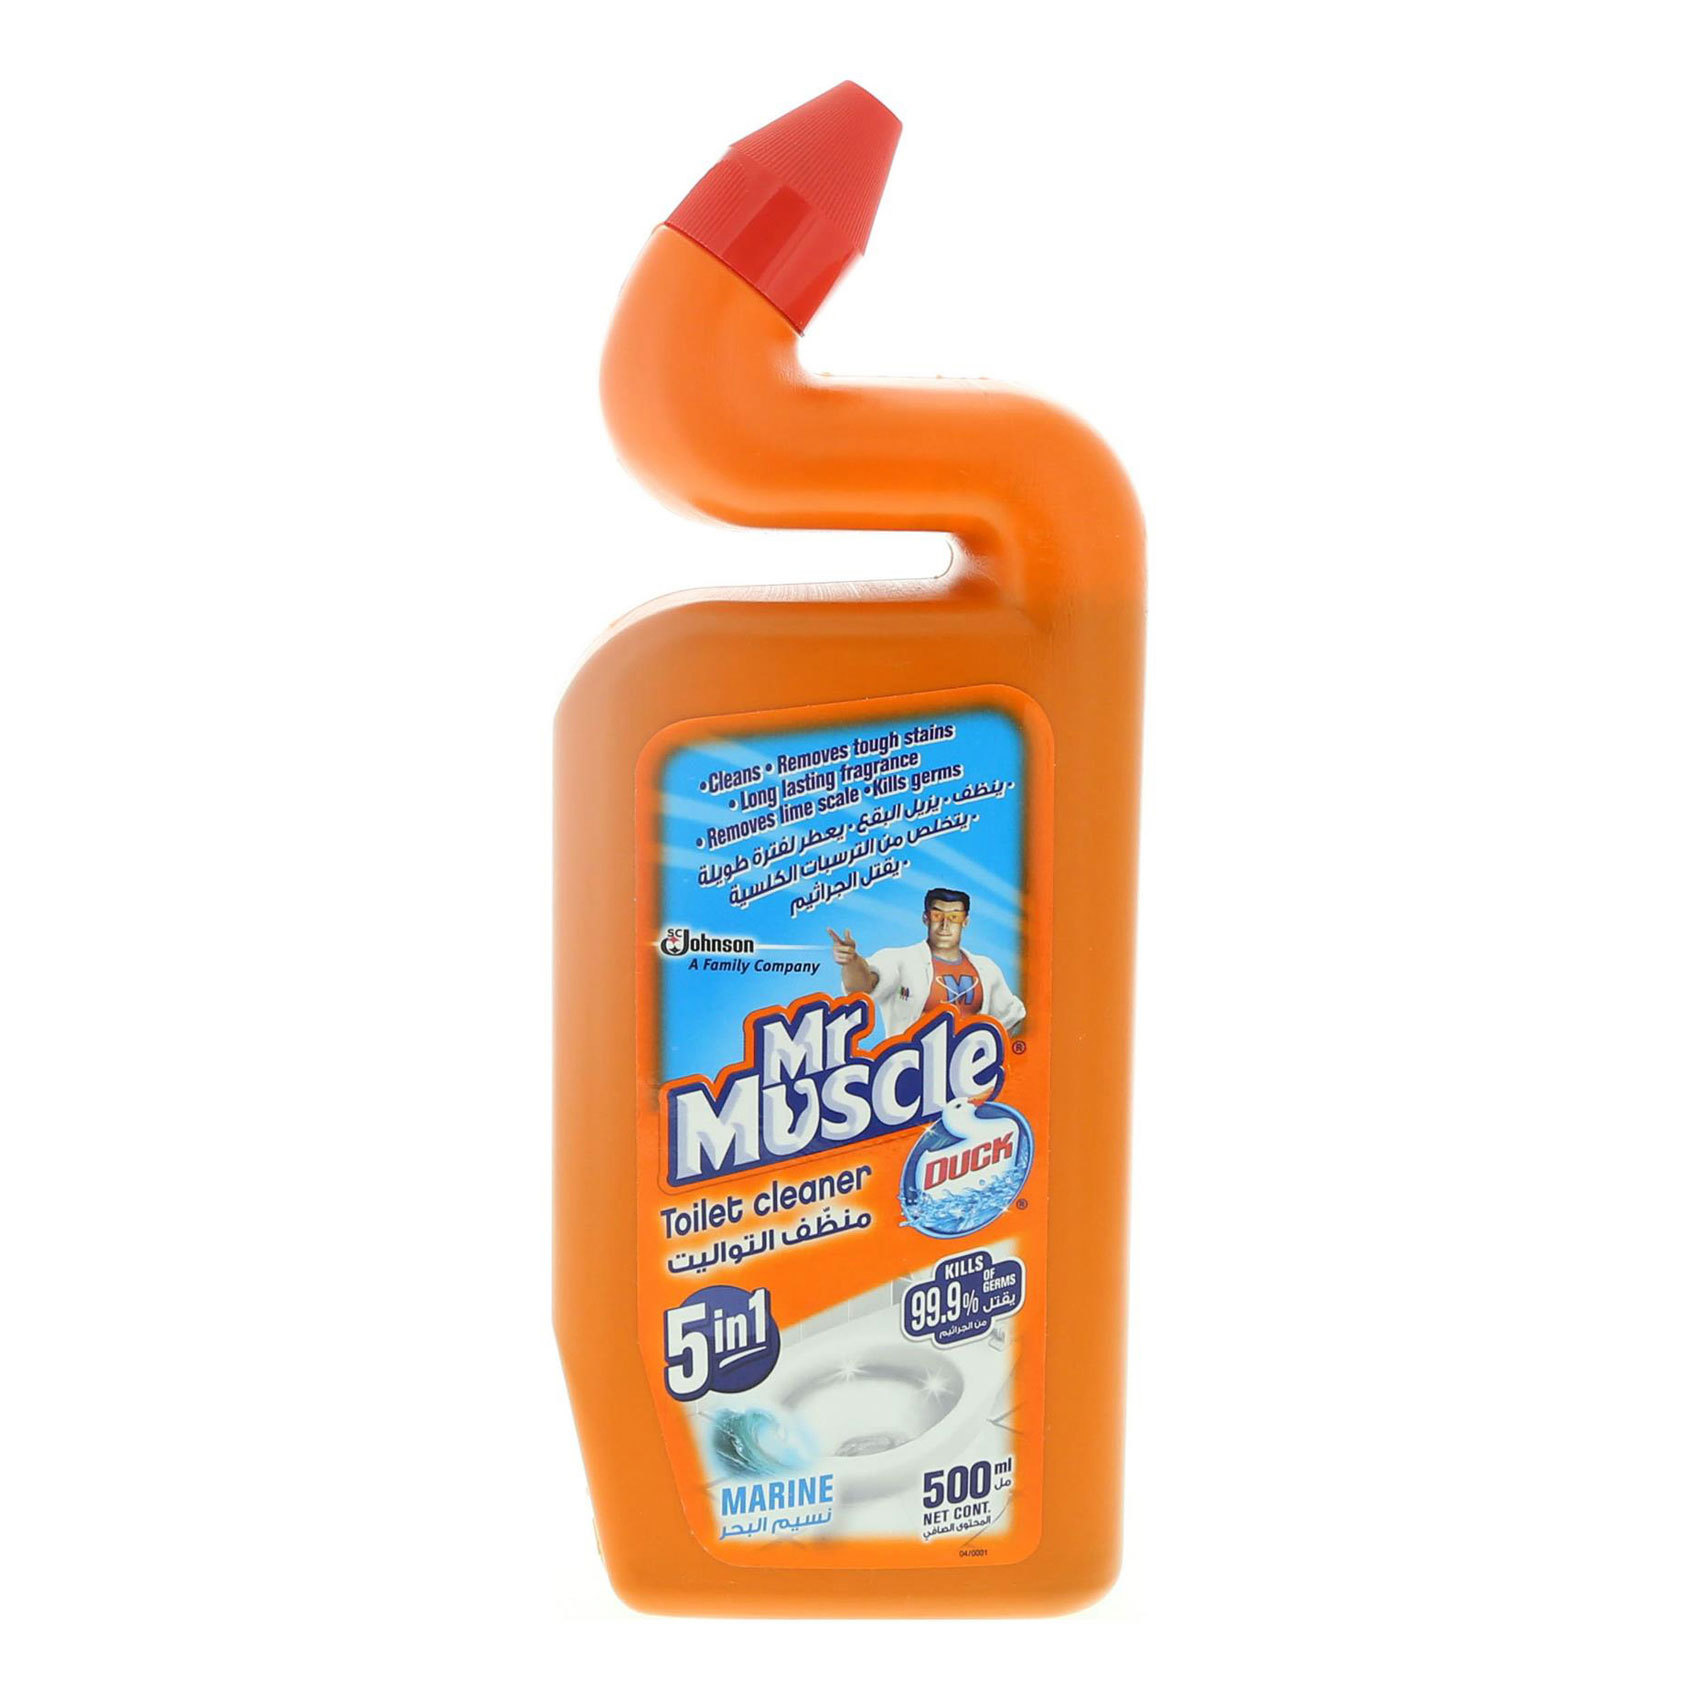 MR. MUSCLE TOILET DUCK MARINE 500ML